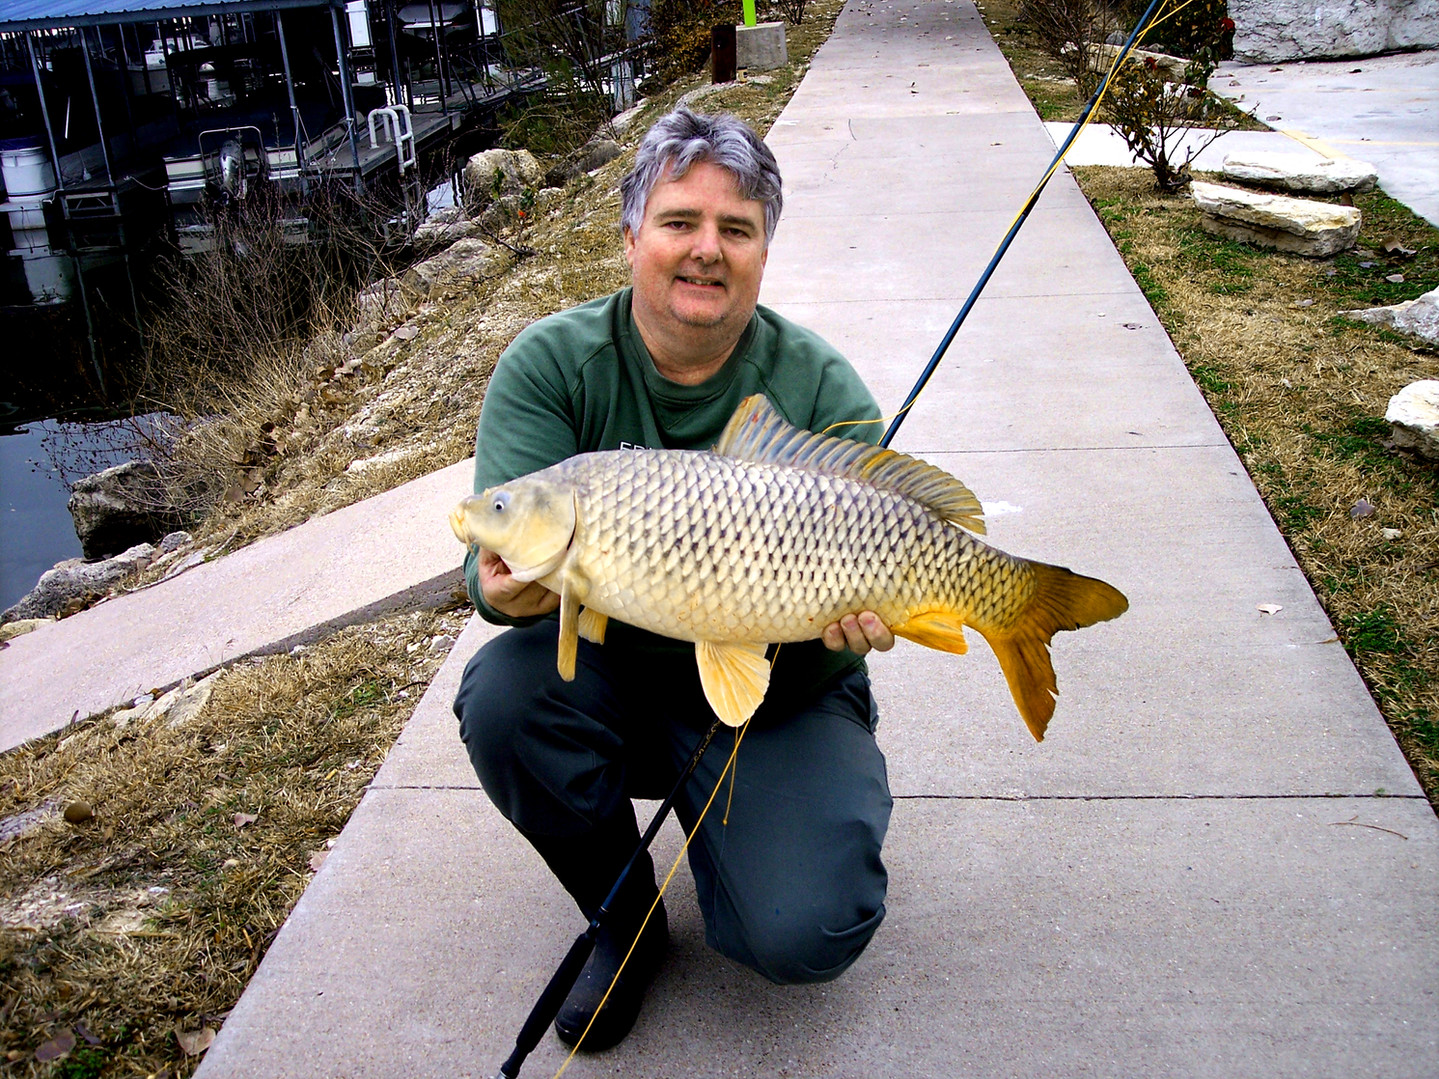 Early Lake Granbury Fly Fishing Waterbody Record Common Carp